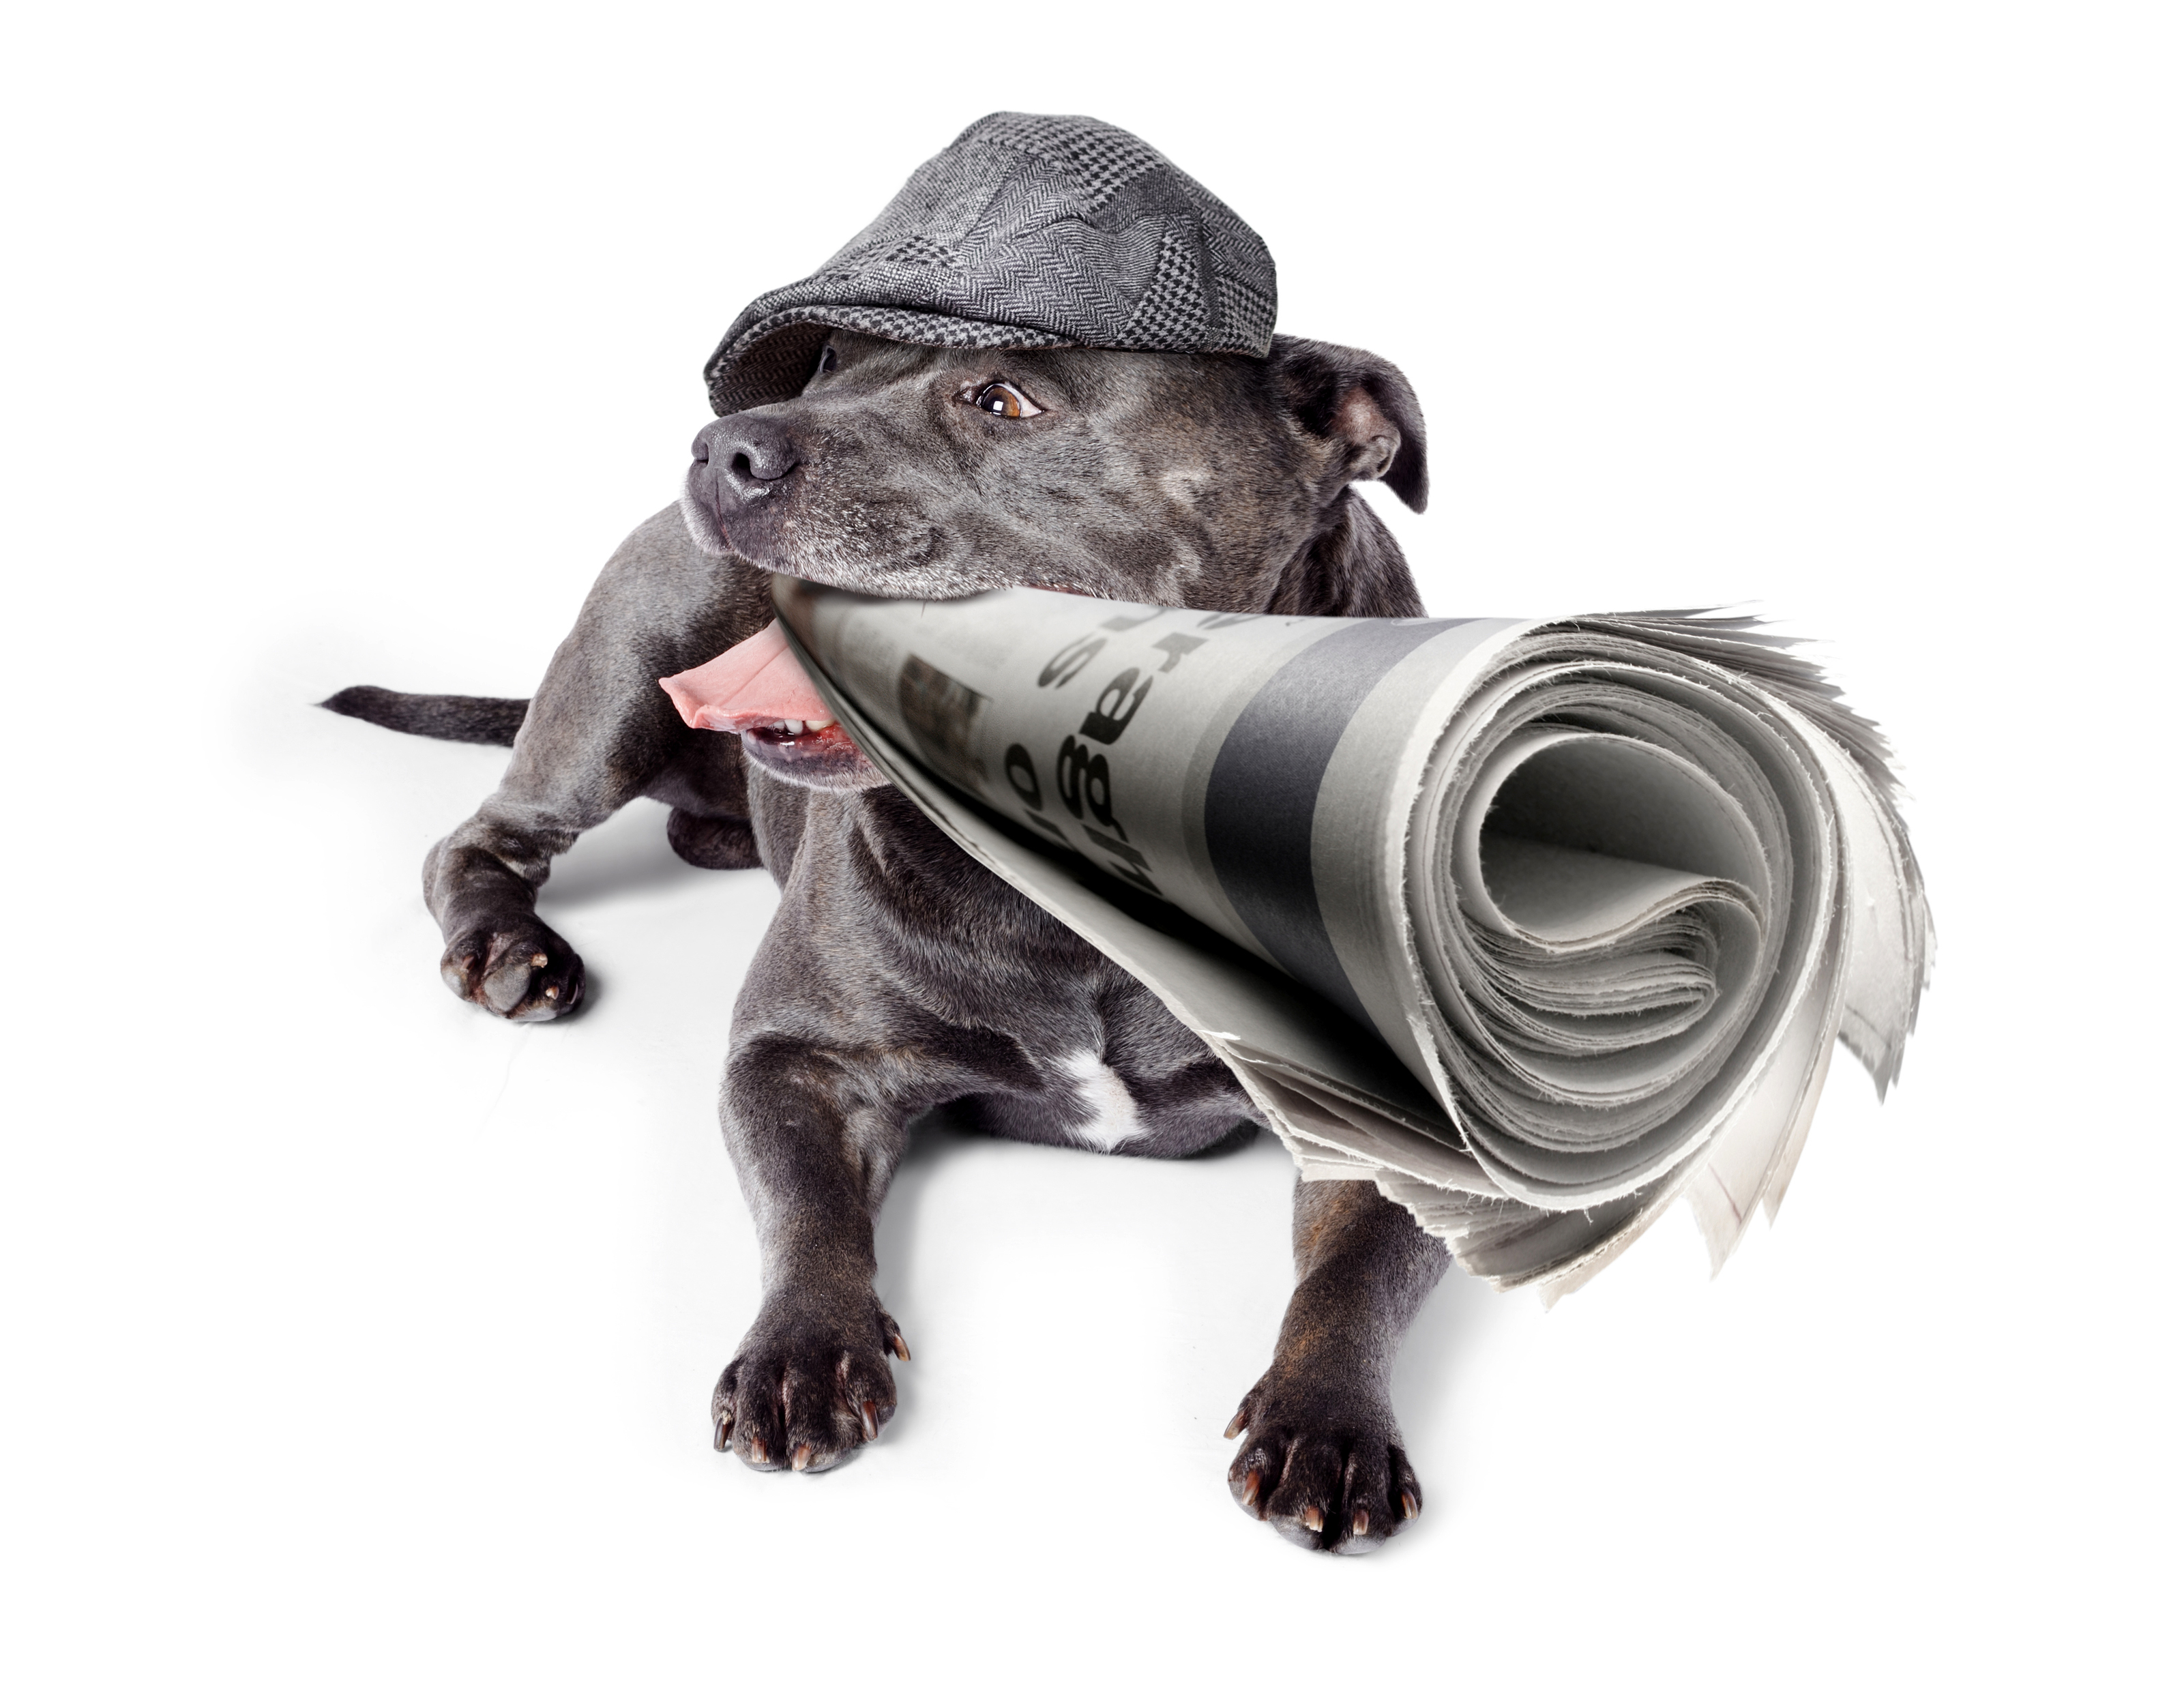 Original_dog_newspaper_dreamstime_xl_30578878